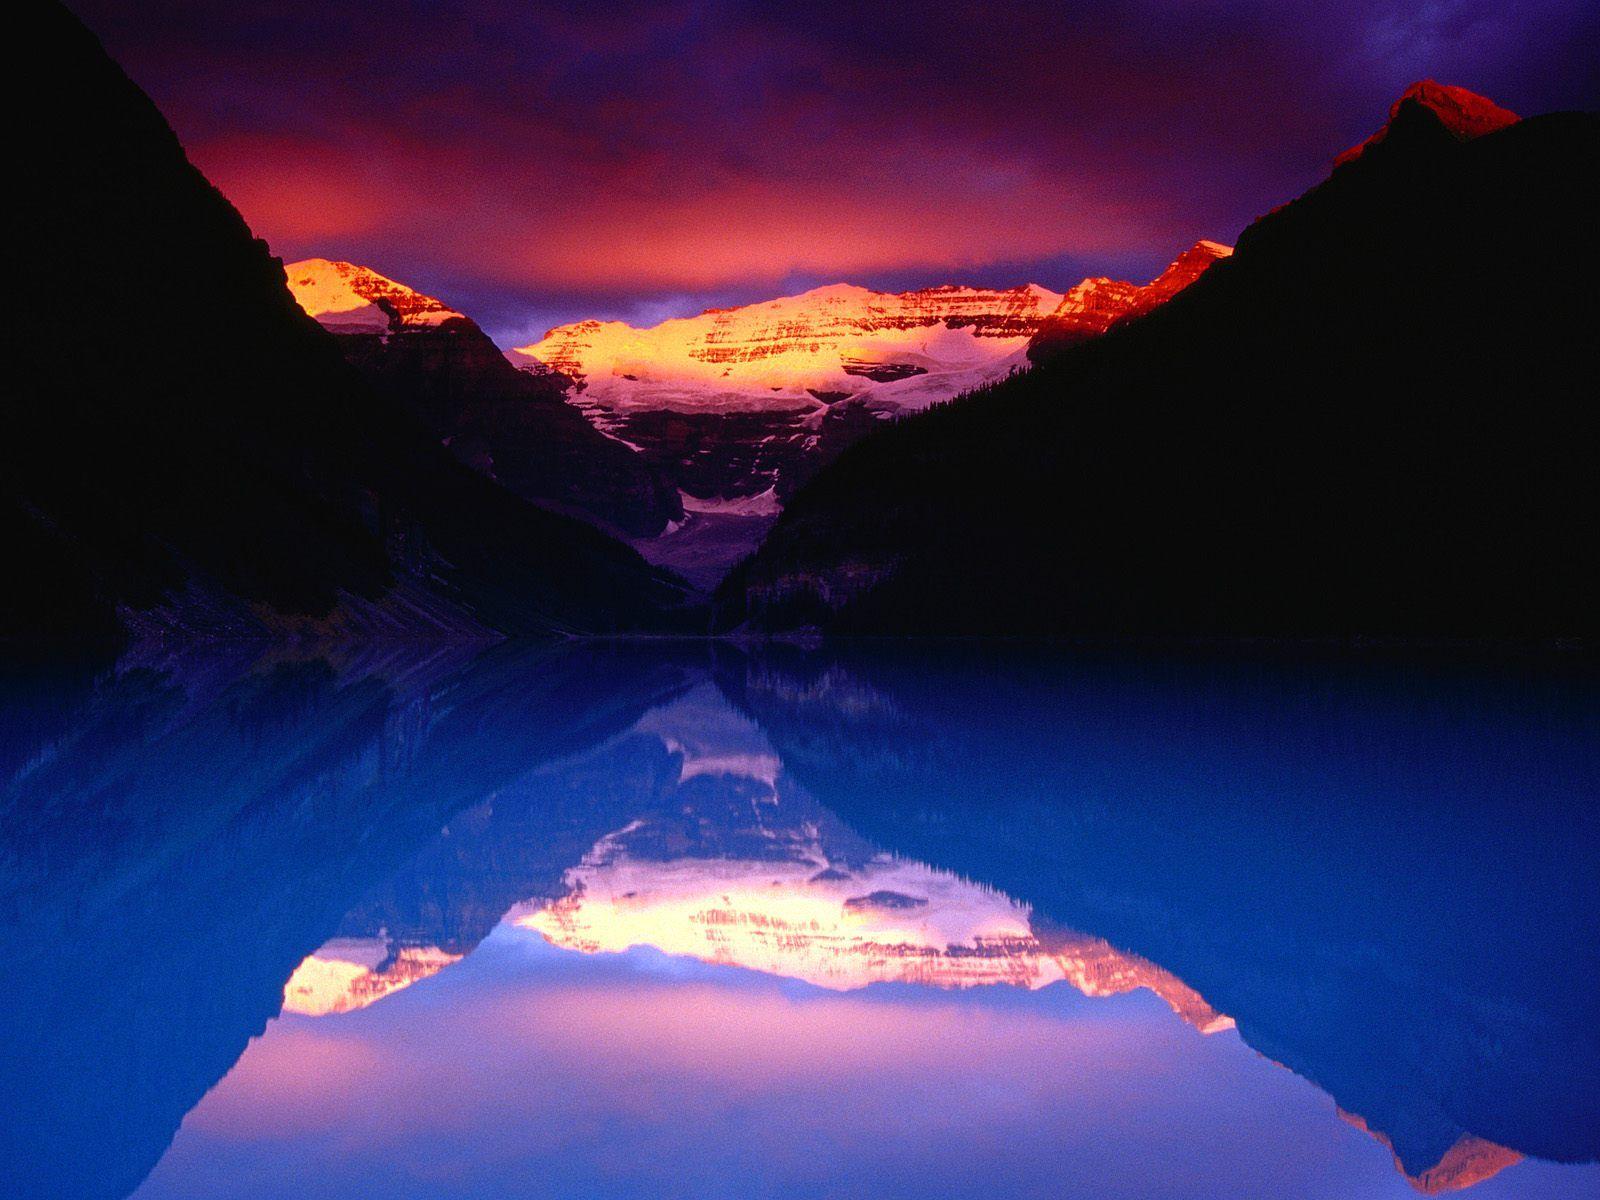 http://1.bp.blogspot.com/-t8qGM3Ybhng/TVY7scVzZ0I/AAAAAAAADS0/v5TTMO_oeJQ/s1600/Banff+Mt+Victoria+and+Lake+Louise.jpg